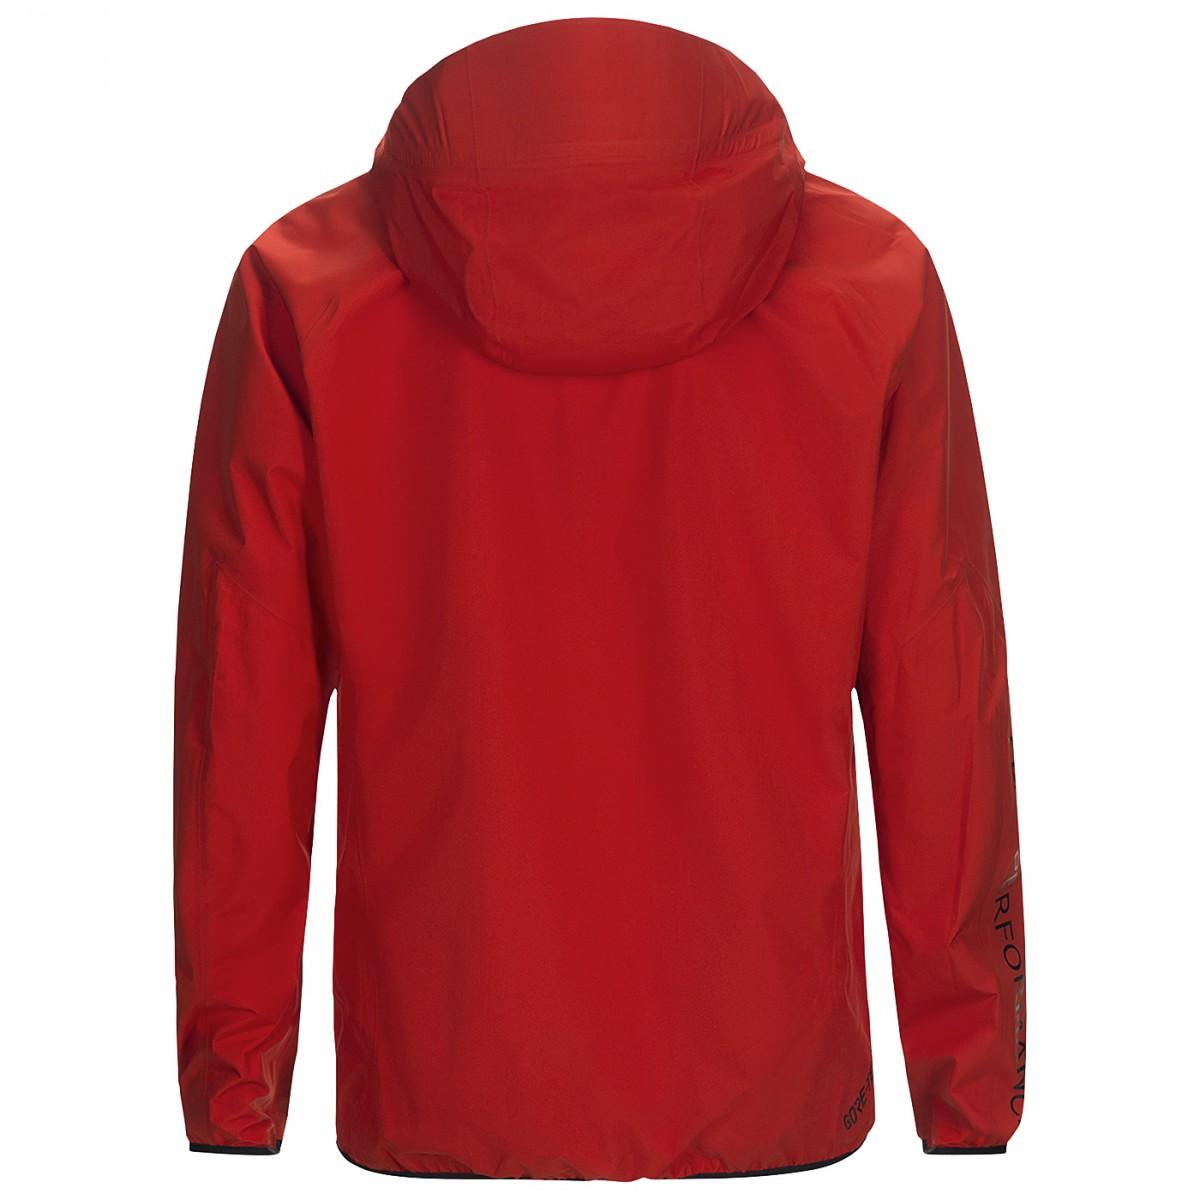 size 40 73272 54ca1 Jacket Peak Performance Pac Gtx Man - Ski clothing